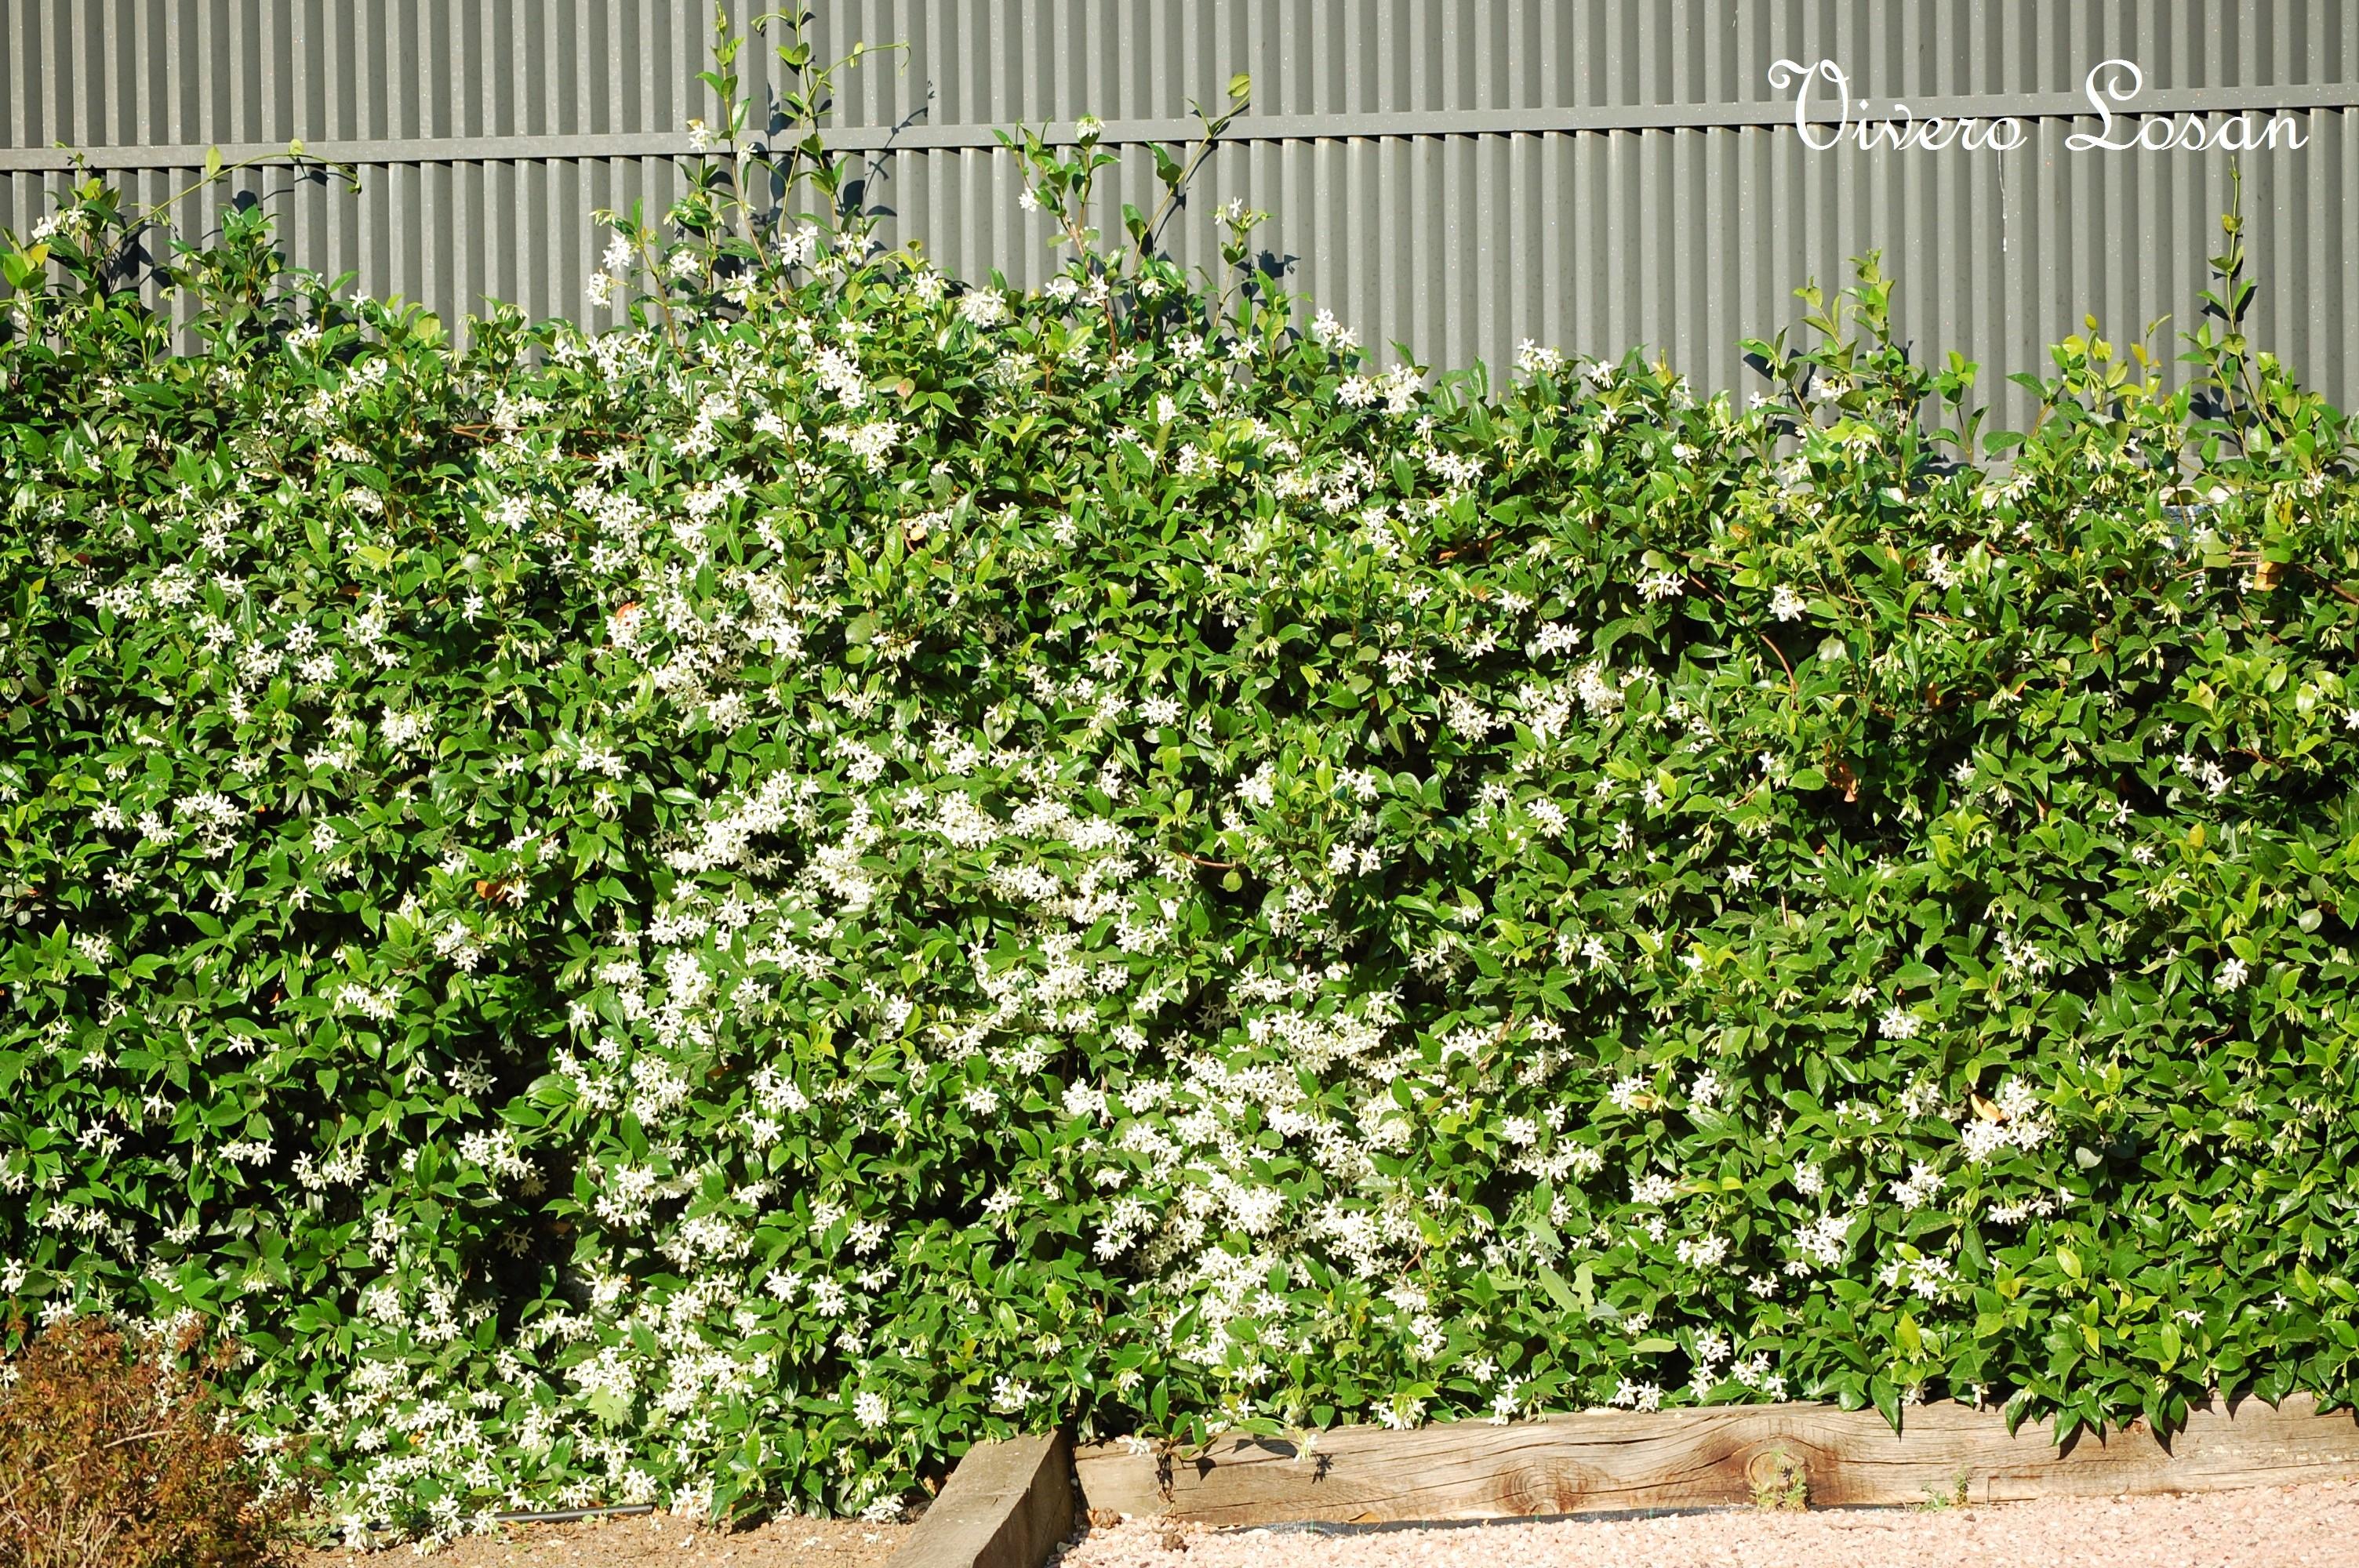 Trachelospermum o rhyncospermum jasminoide for Arbustos de hoja perenne resistentes al frio